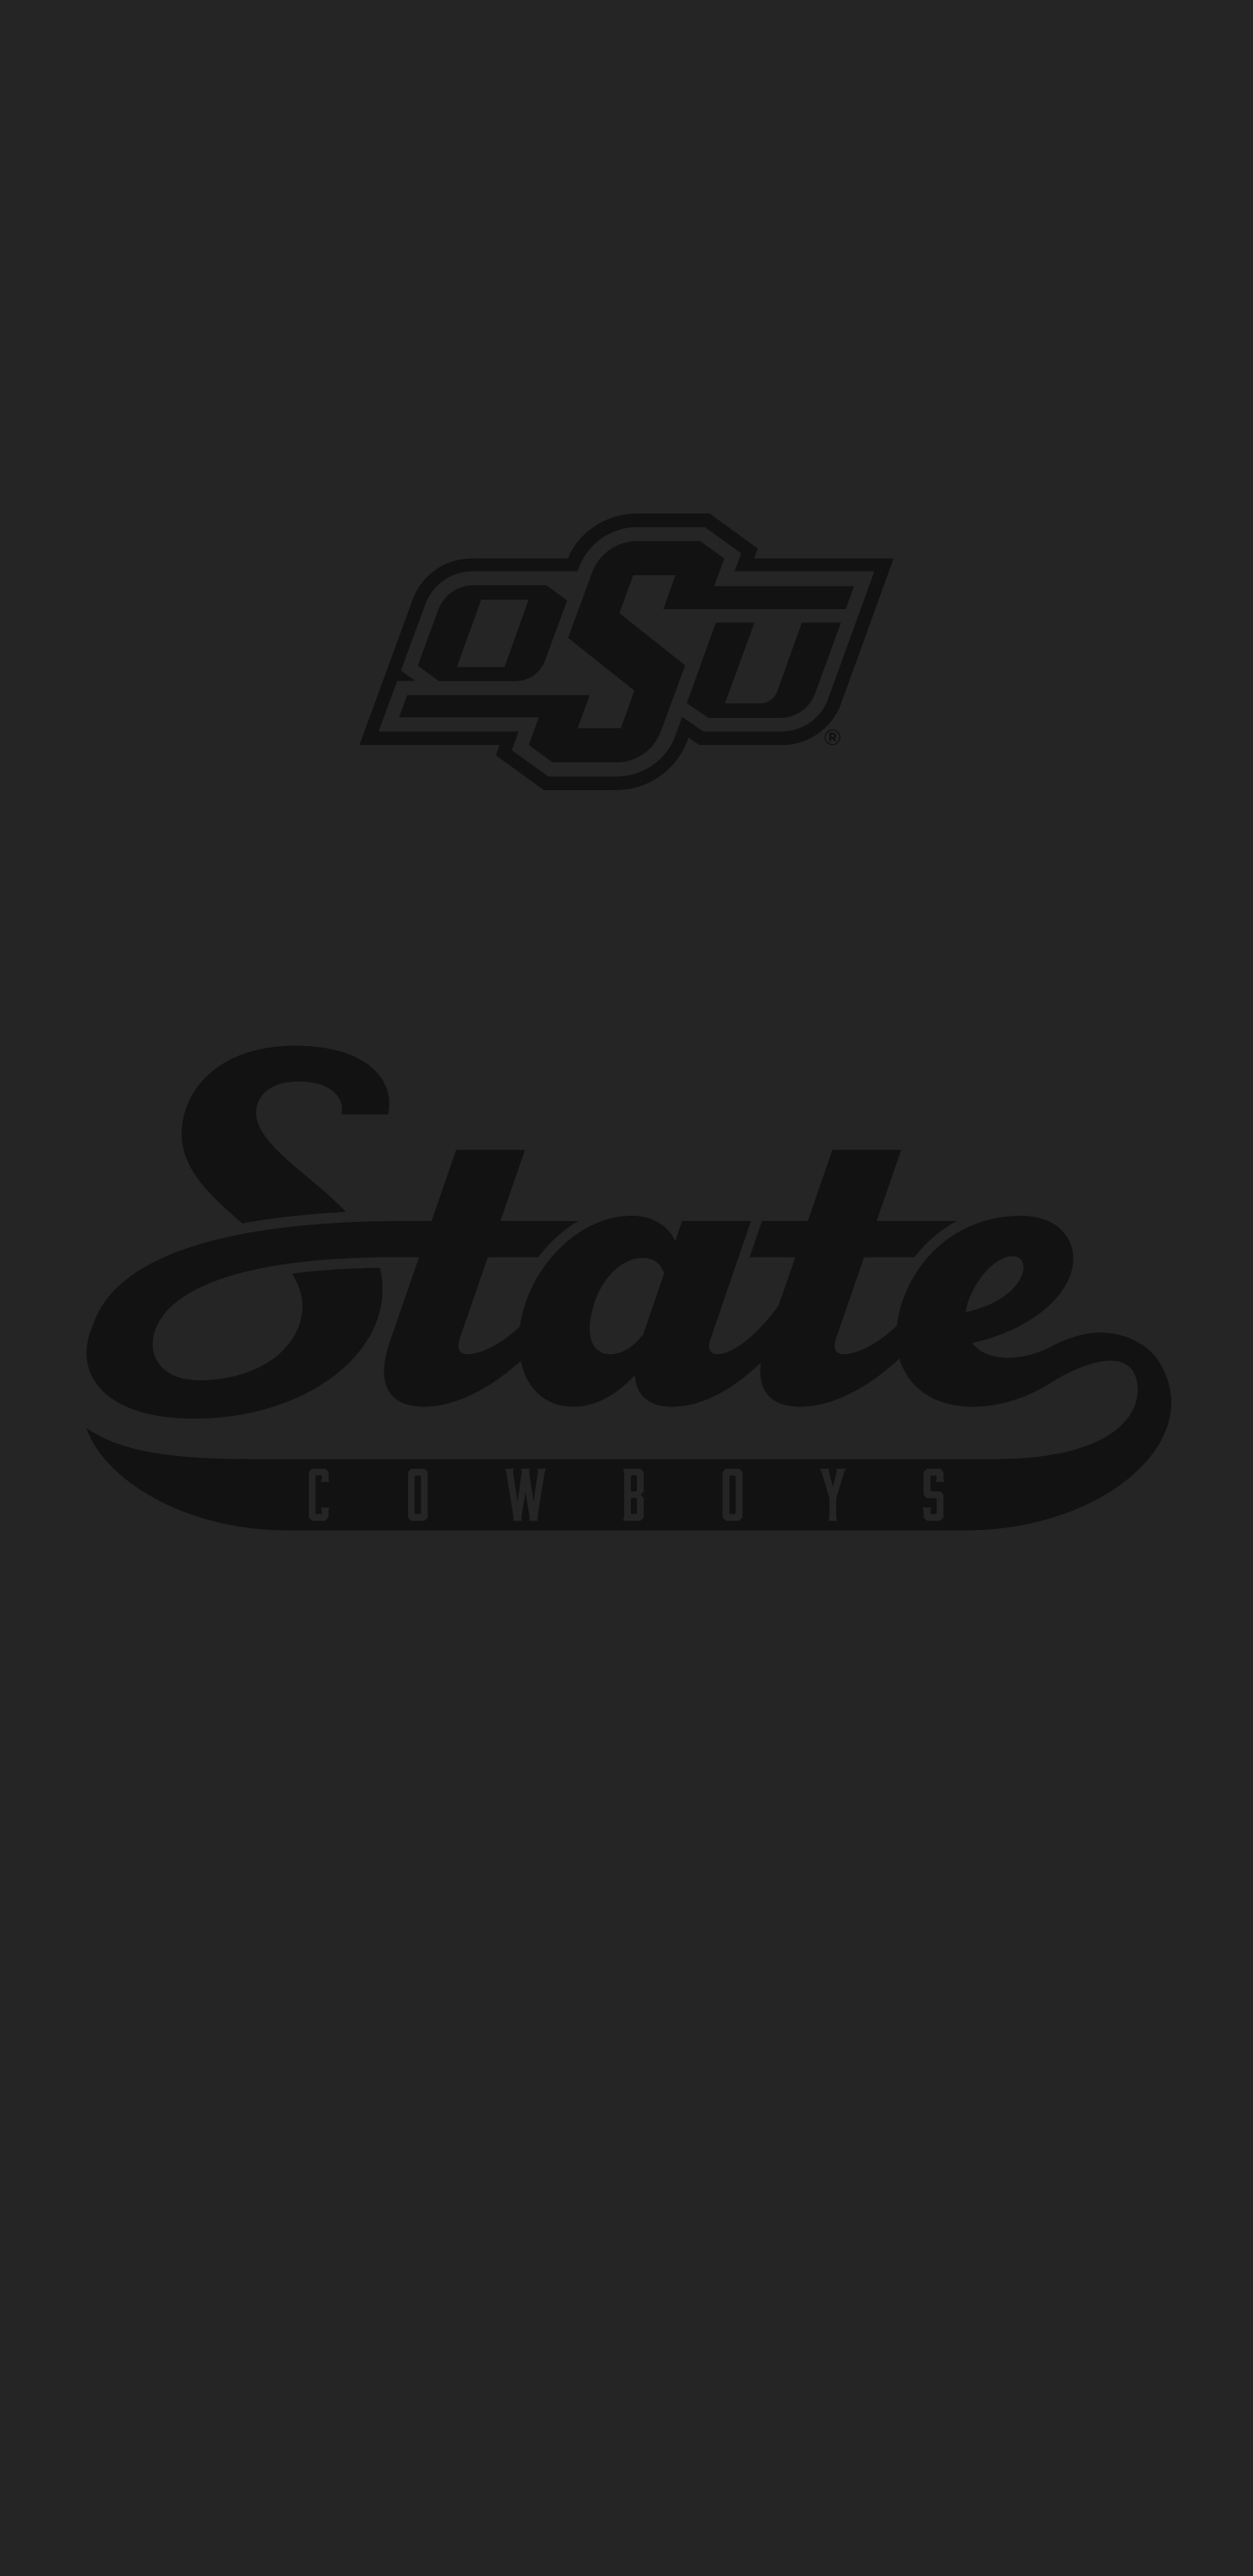 Mobile Backgrounds Oklahoma State University